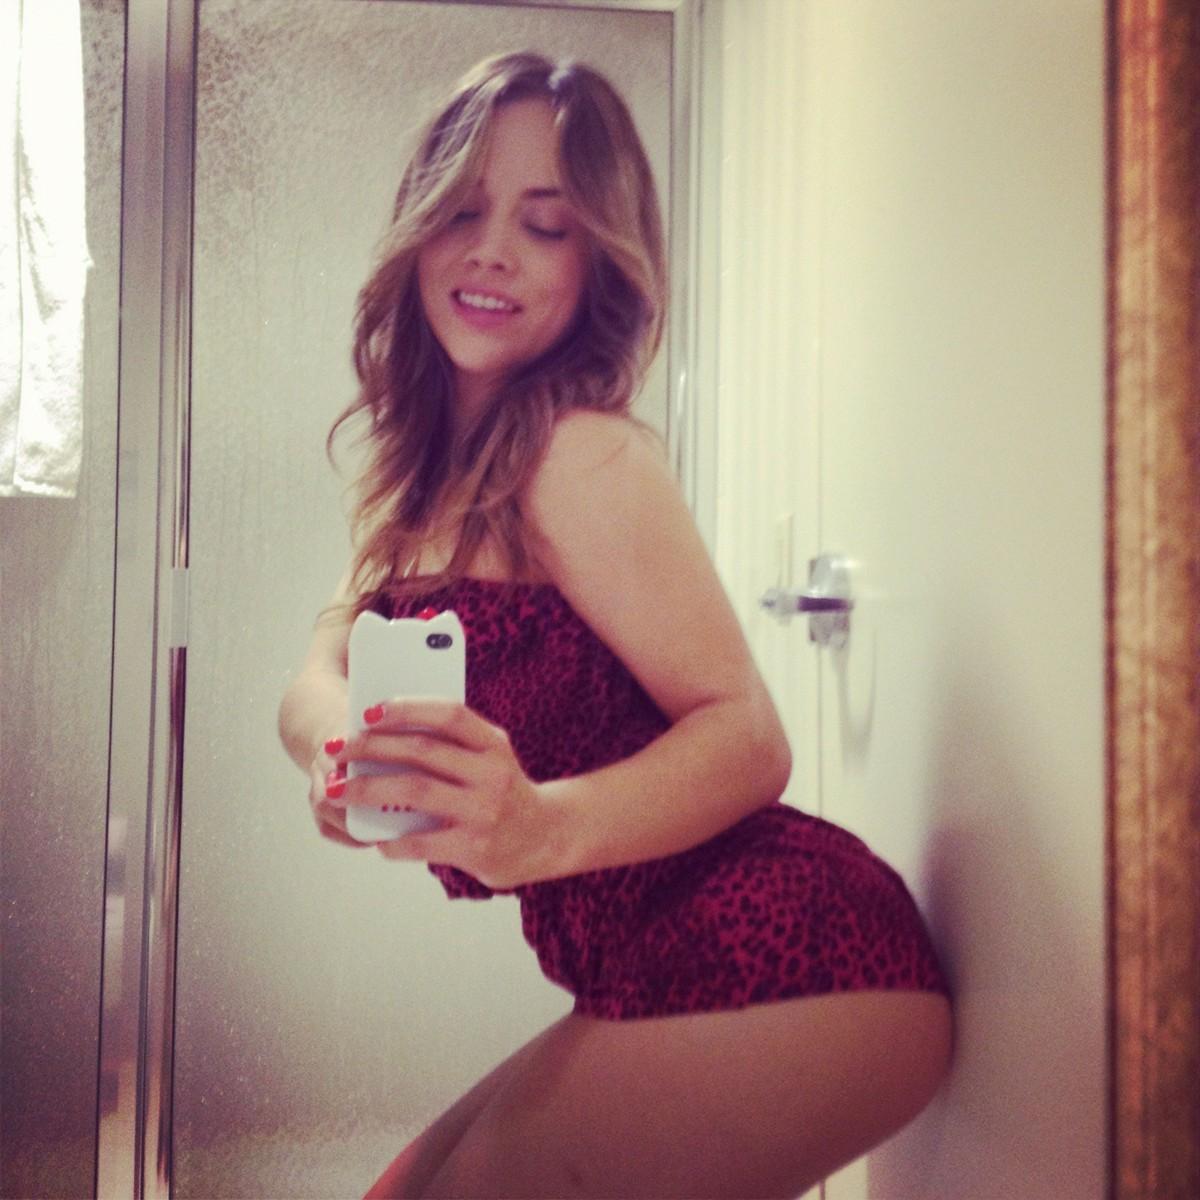 Kristina Rose taking a selfie